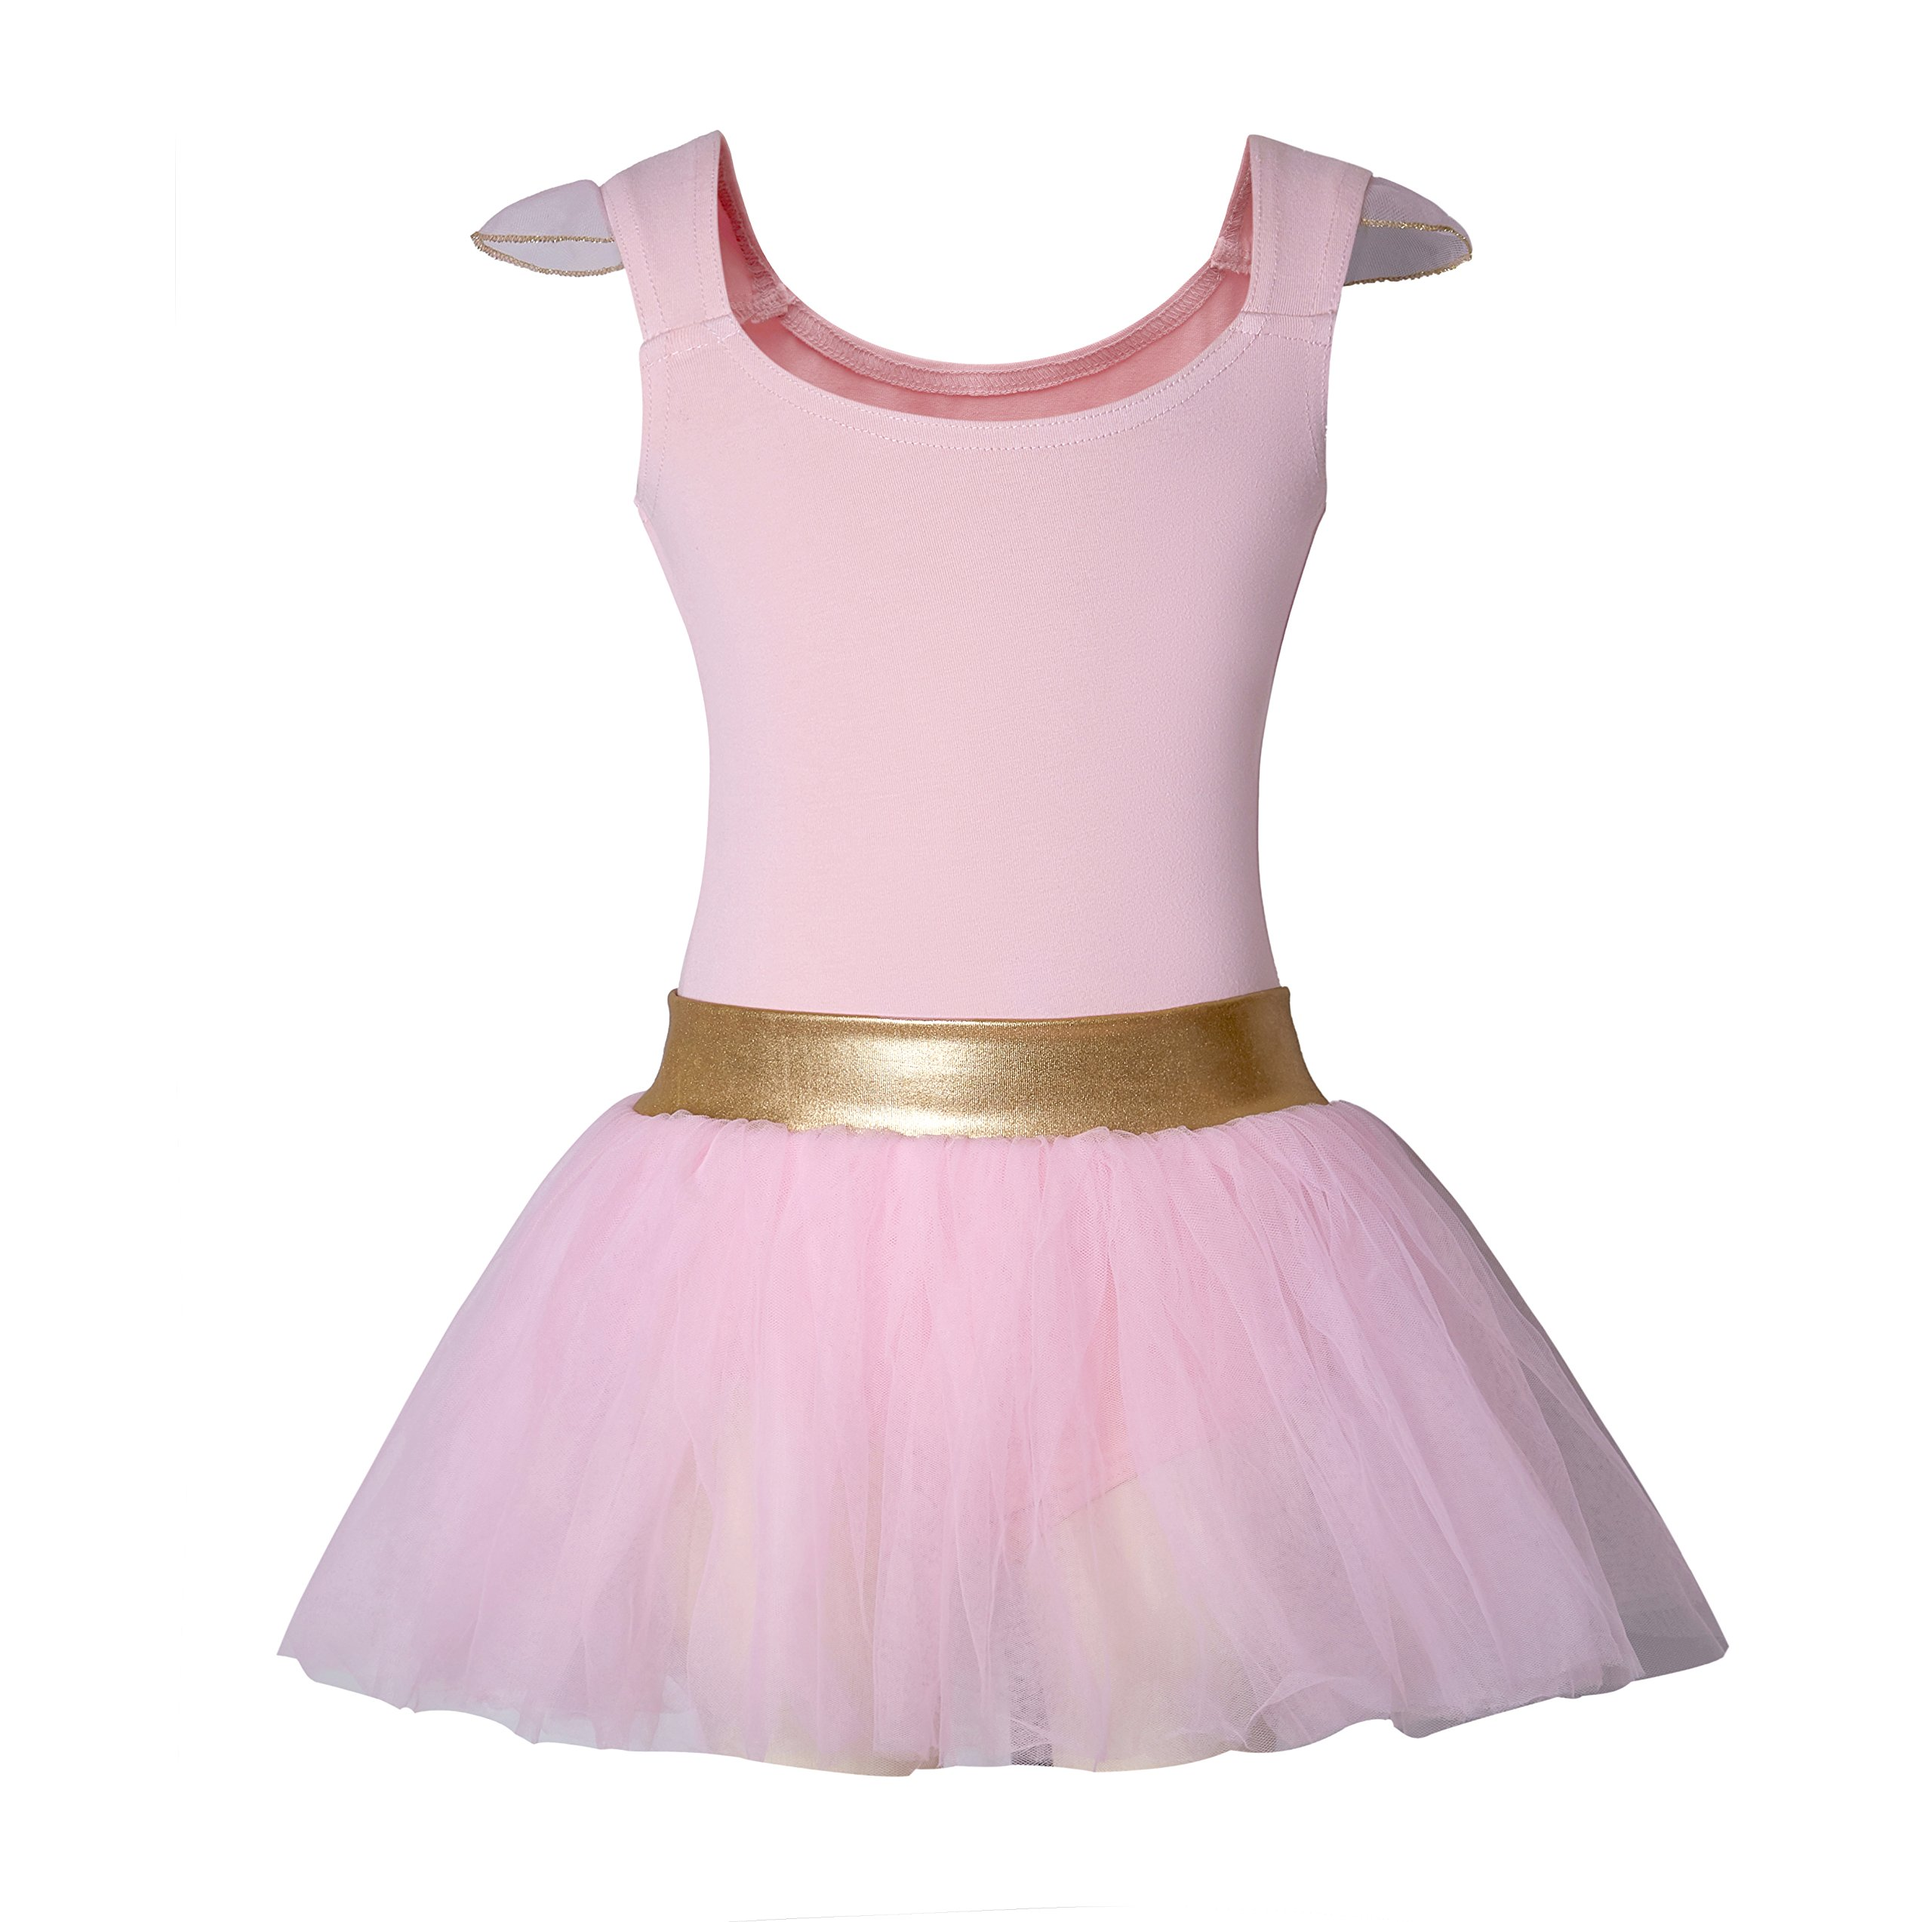 DANSHOW Girls'Tank Skirt Leotards for Ballet Dance with Tutu, Gold Waist and Flying Sleeves(4-6,pink)